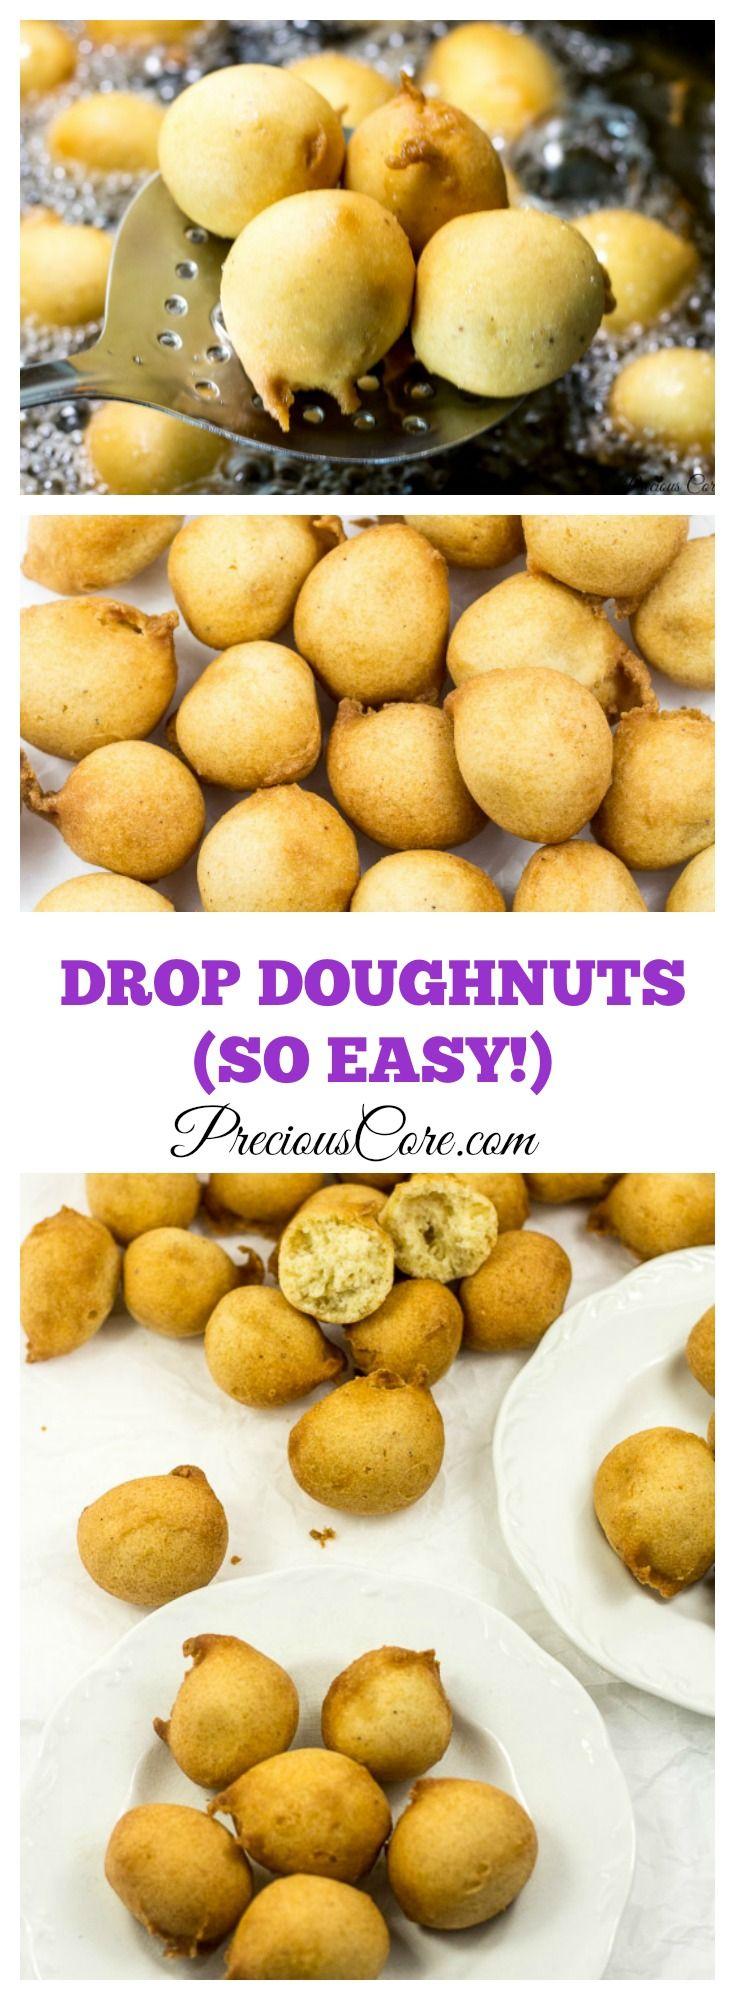 Easy Drop Doughnuts Recipe - Precious Core